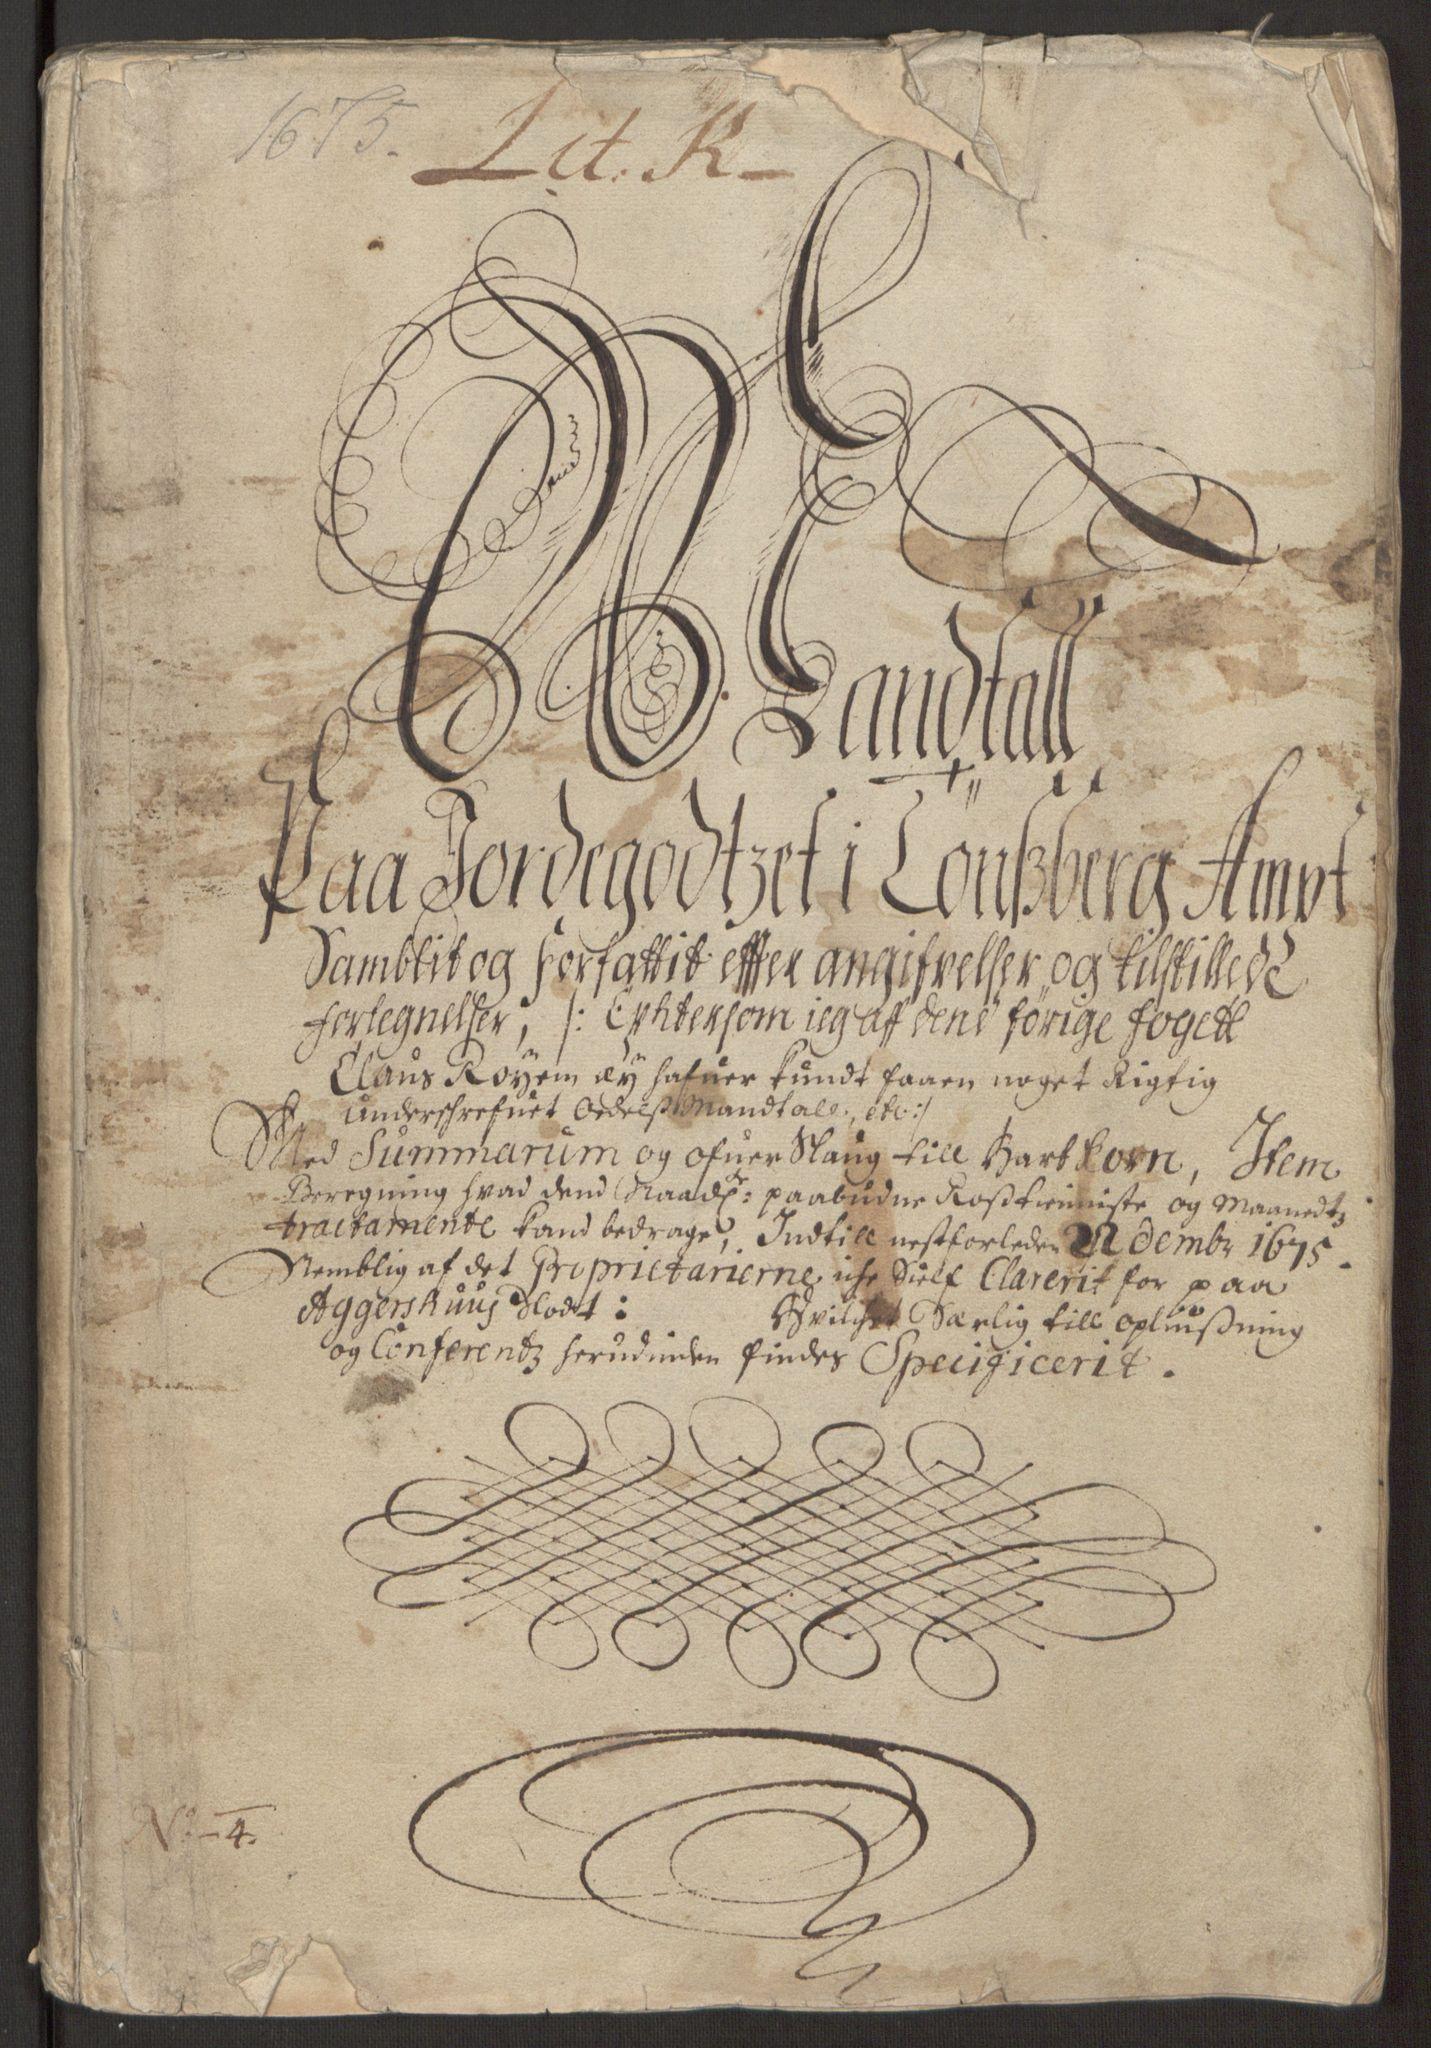 RA, Rentekammeret inntil 1814, Reviderte regnskaper, Fogderegnskap, R32/L1843: Fogderegnskap Jarlsberg grevskap, 1674-1675, s. 407